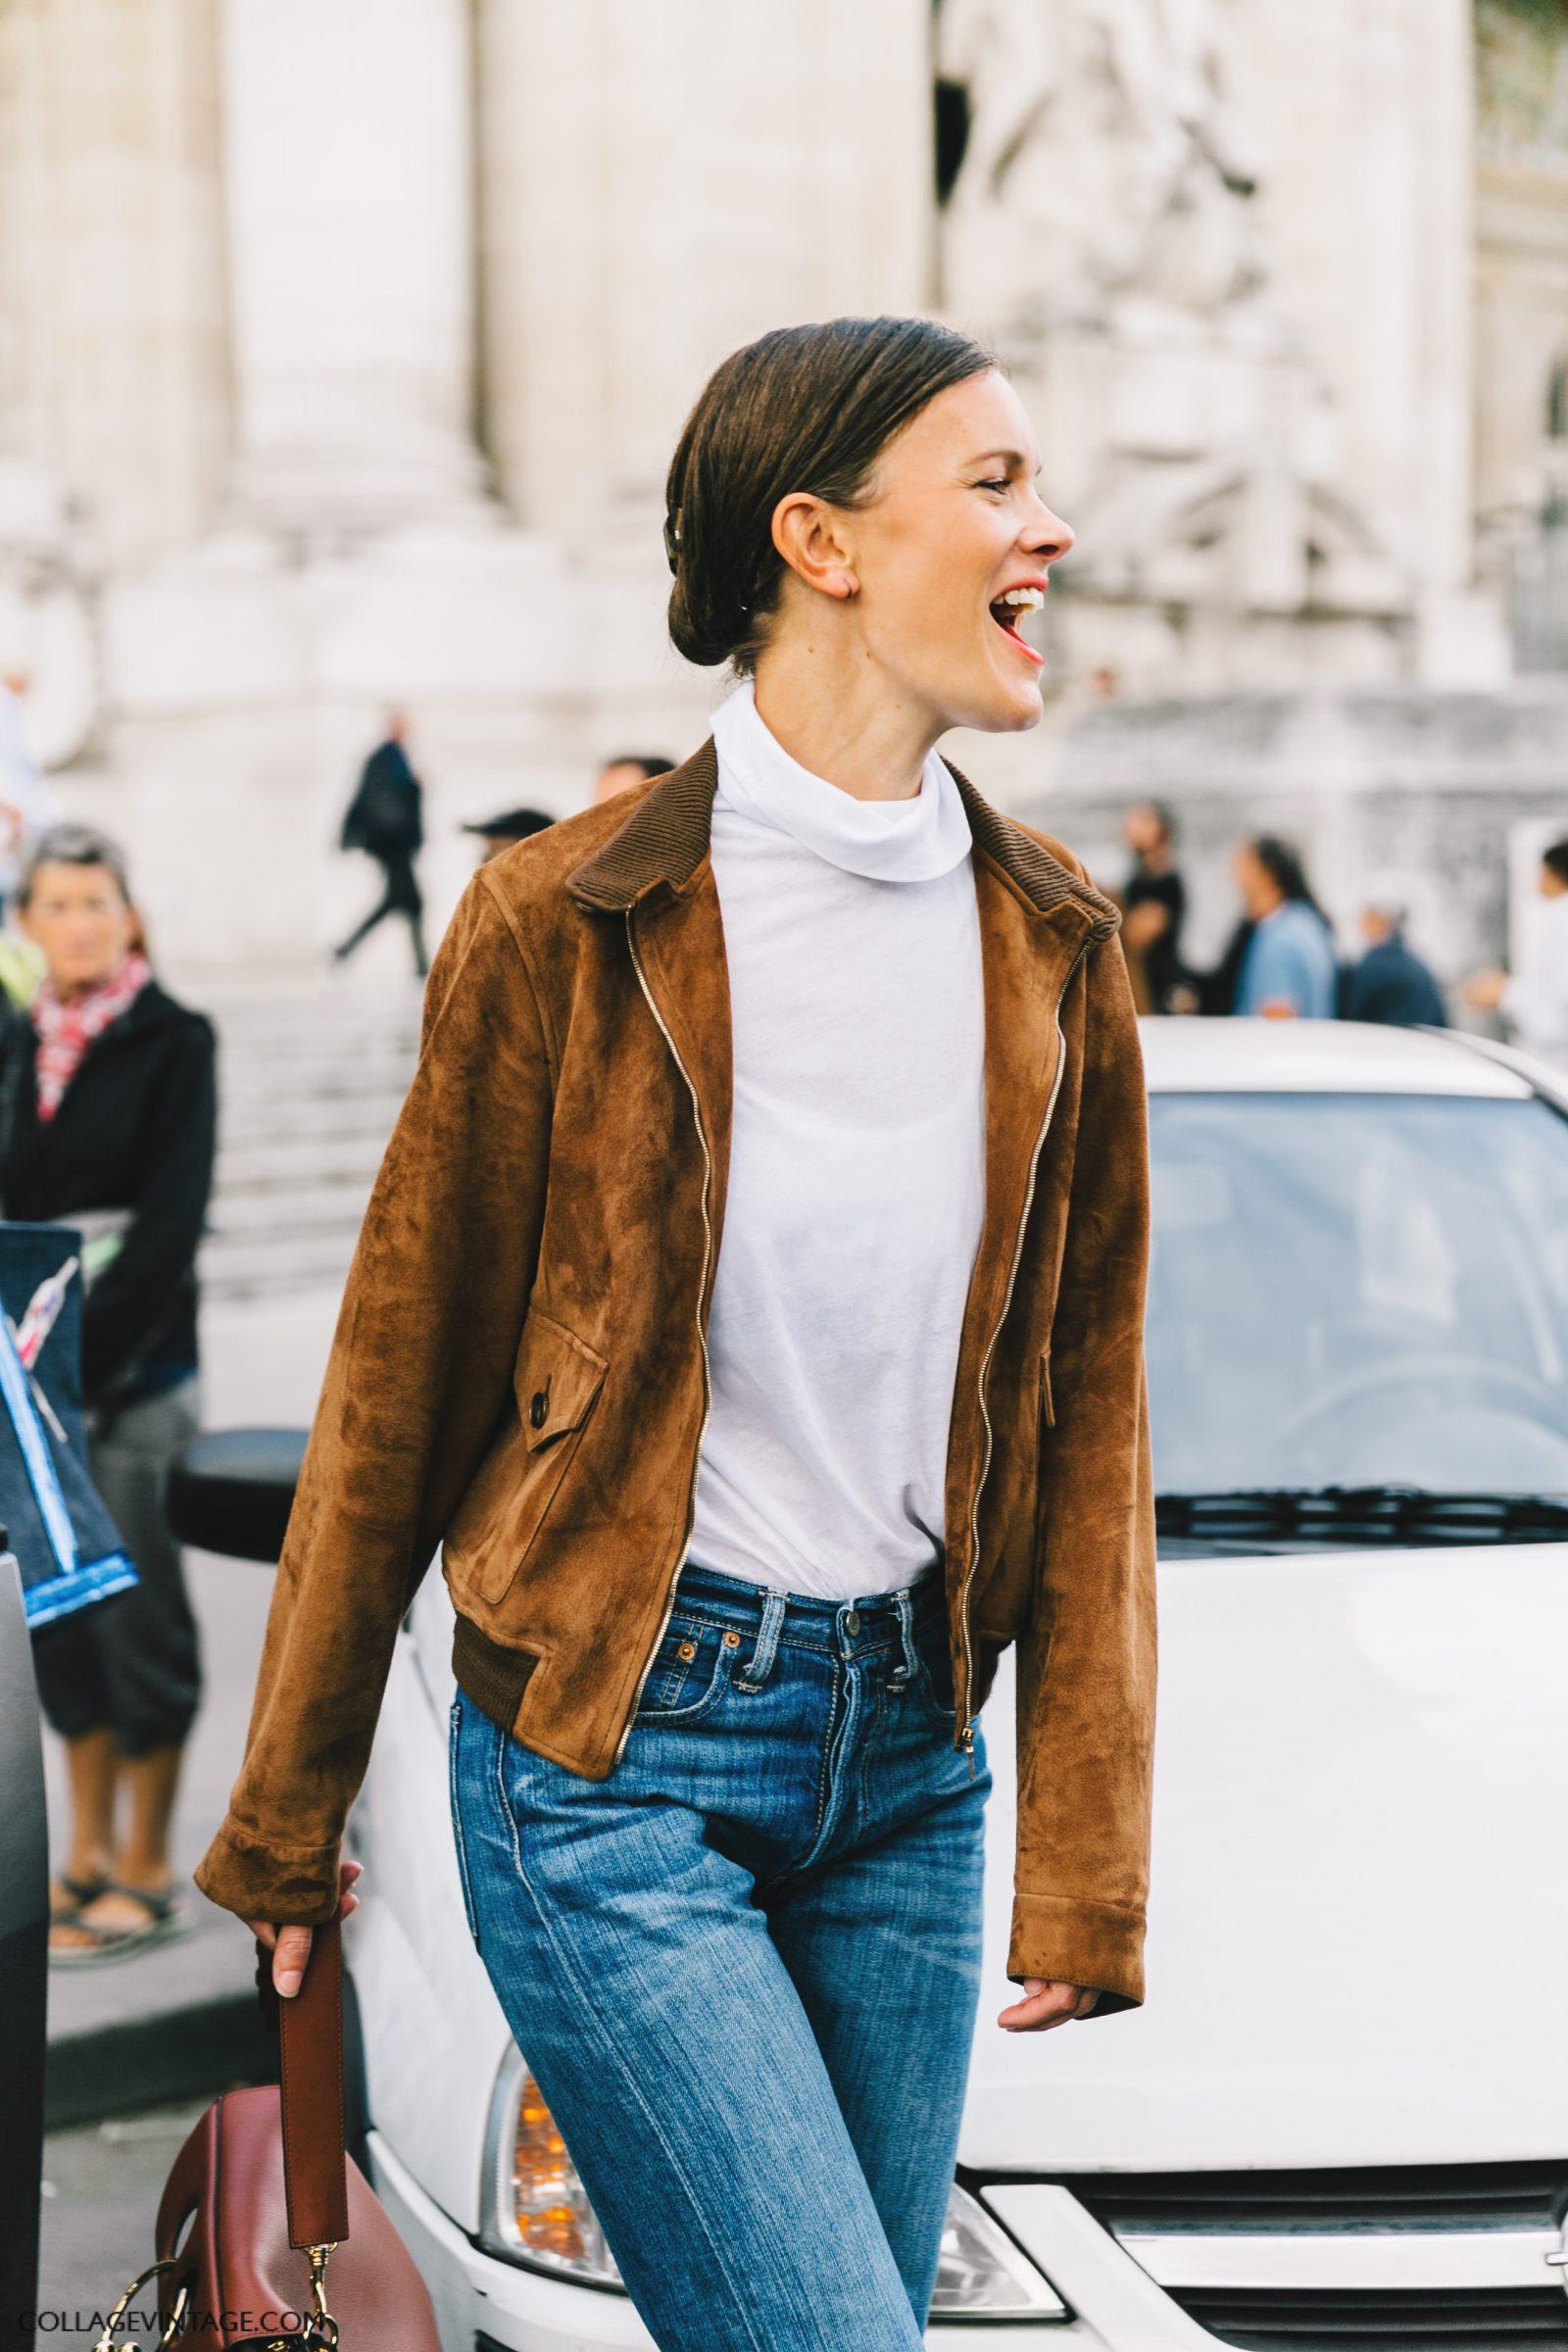 pfw-paris_fashion_week_ss17-street_style-outfits-collage_vintage-rochas-courreges-dries_van_noten-lanvin-guy_laroche-63